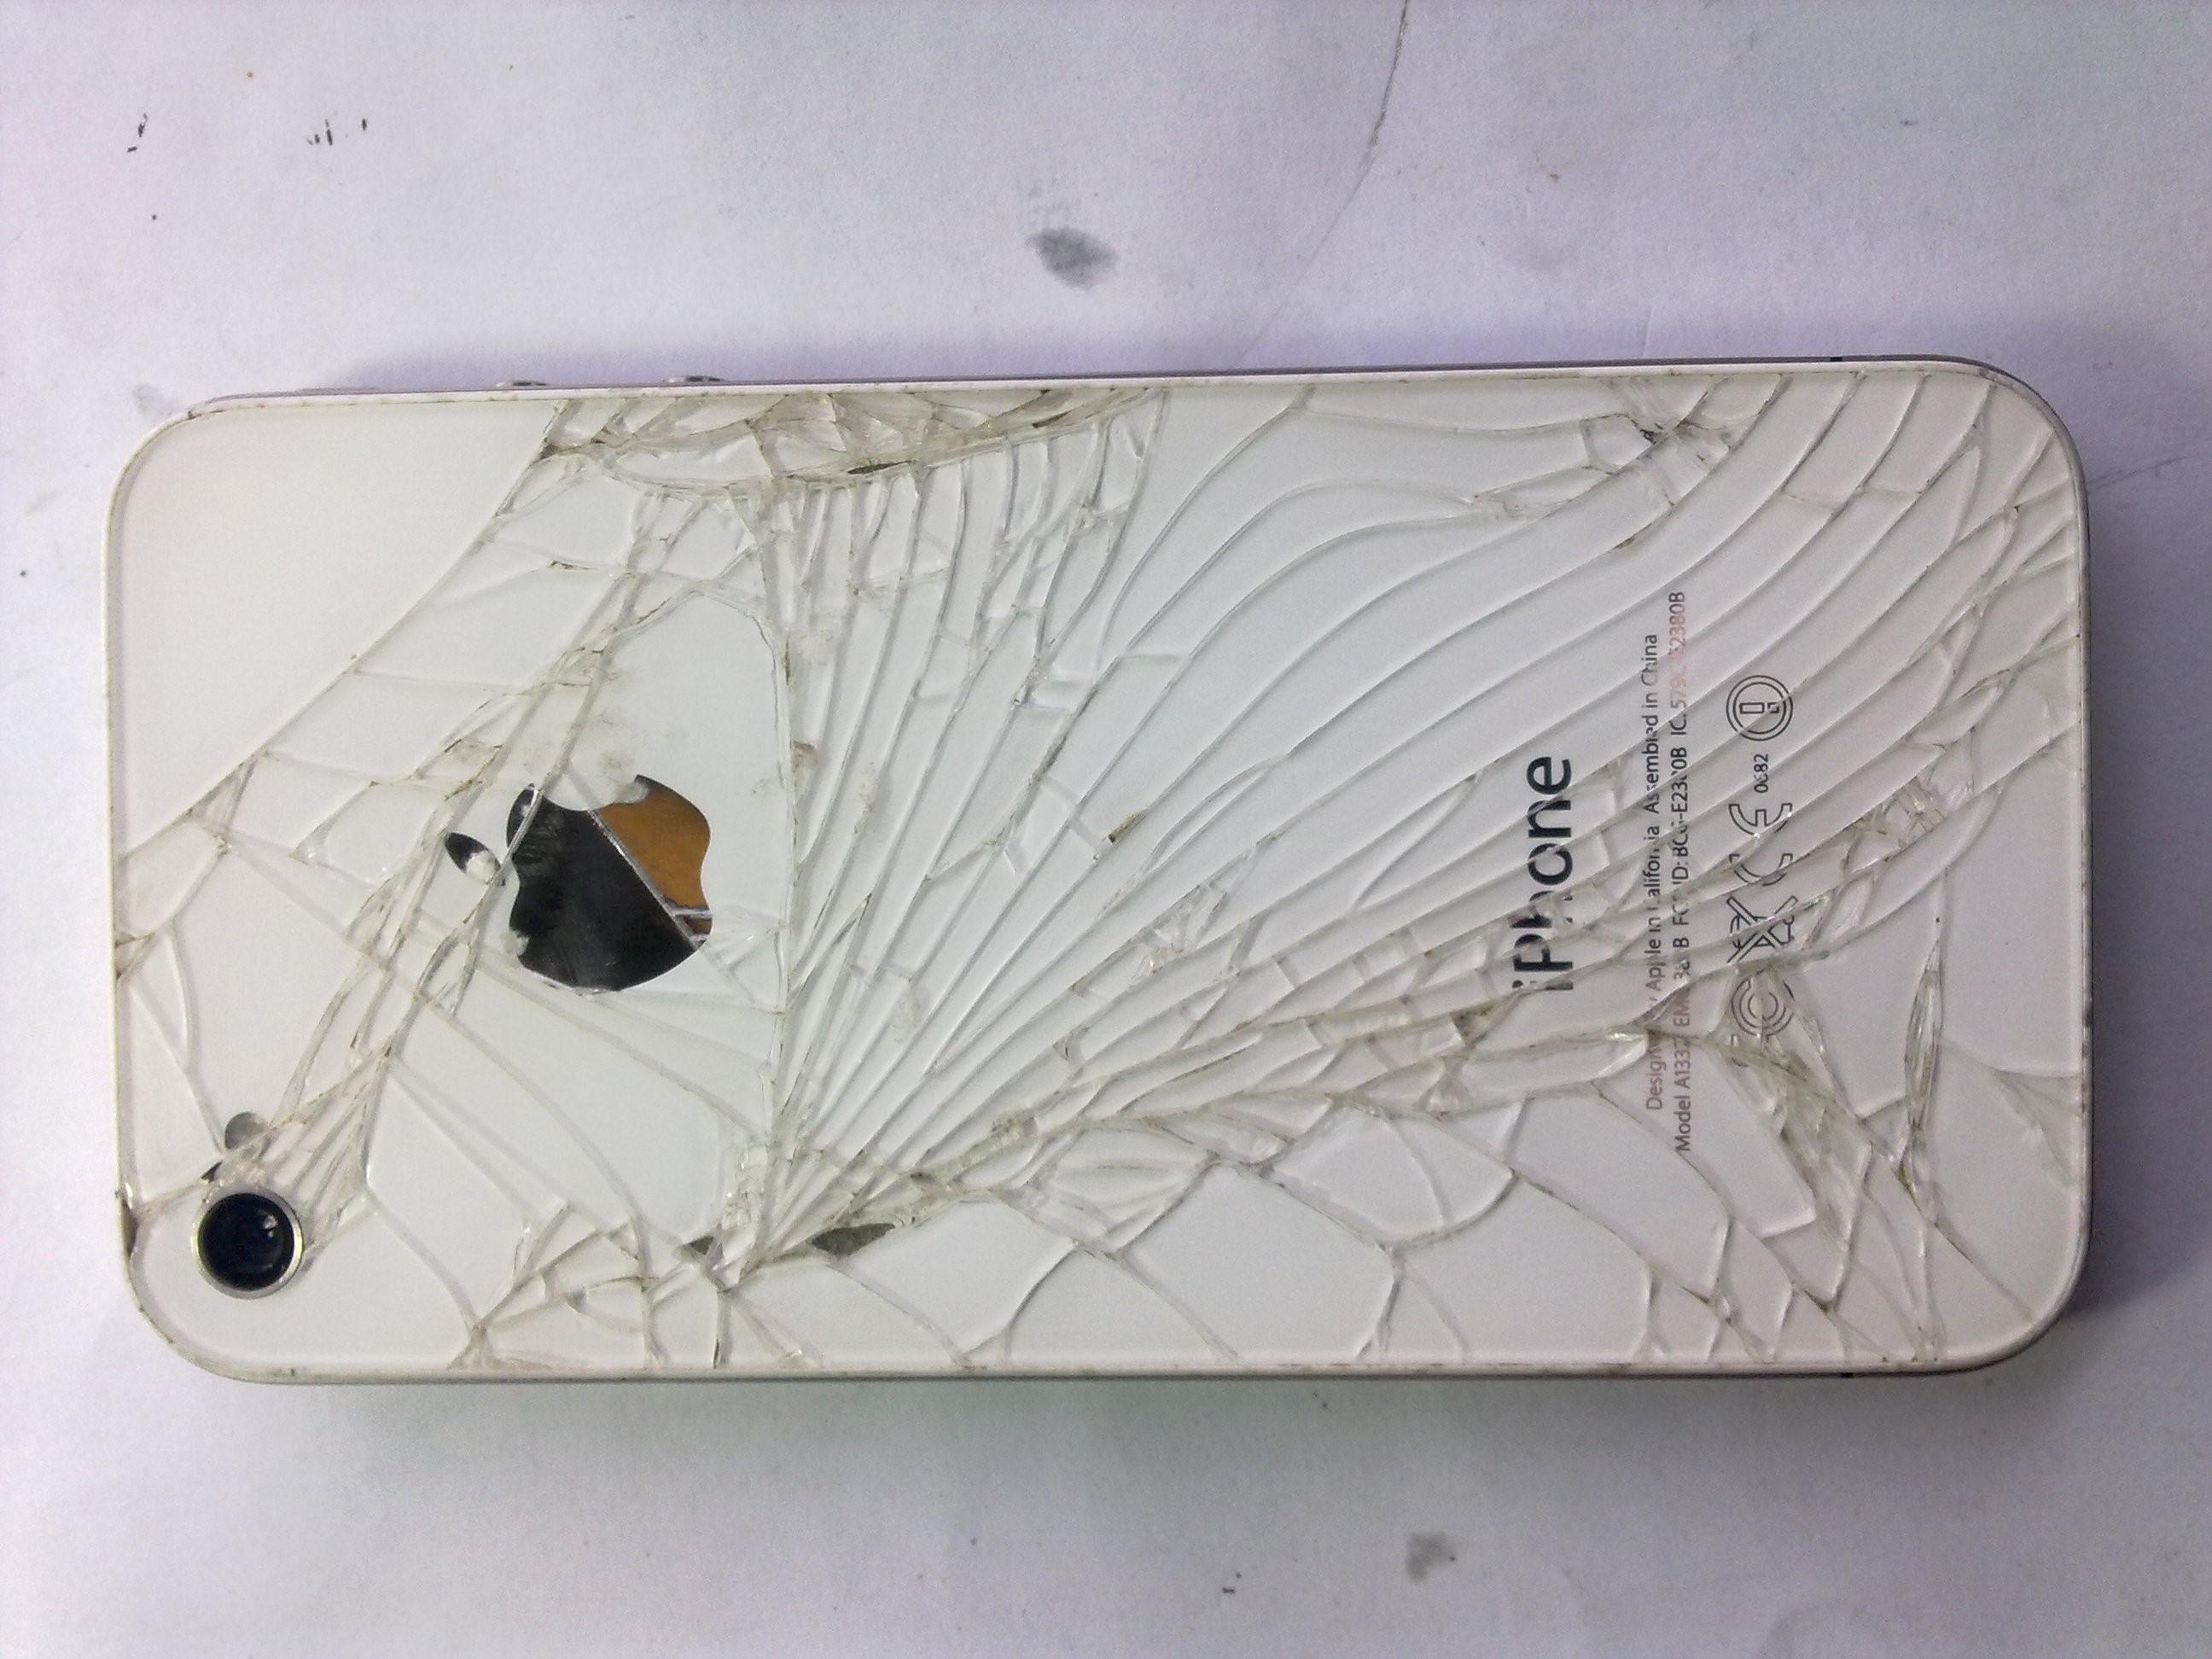 iPhone 4s после падения